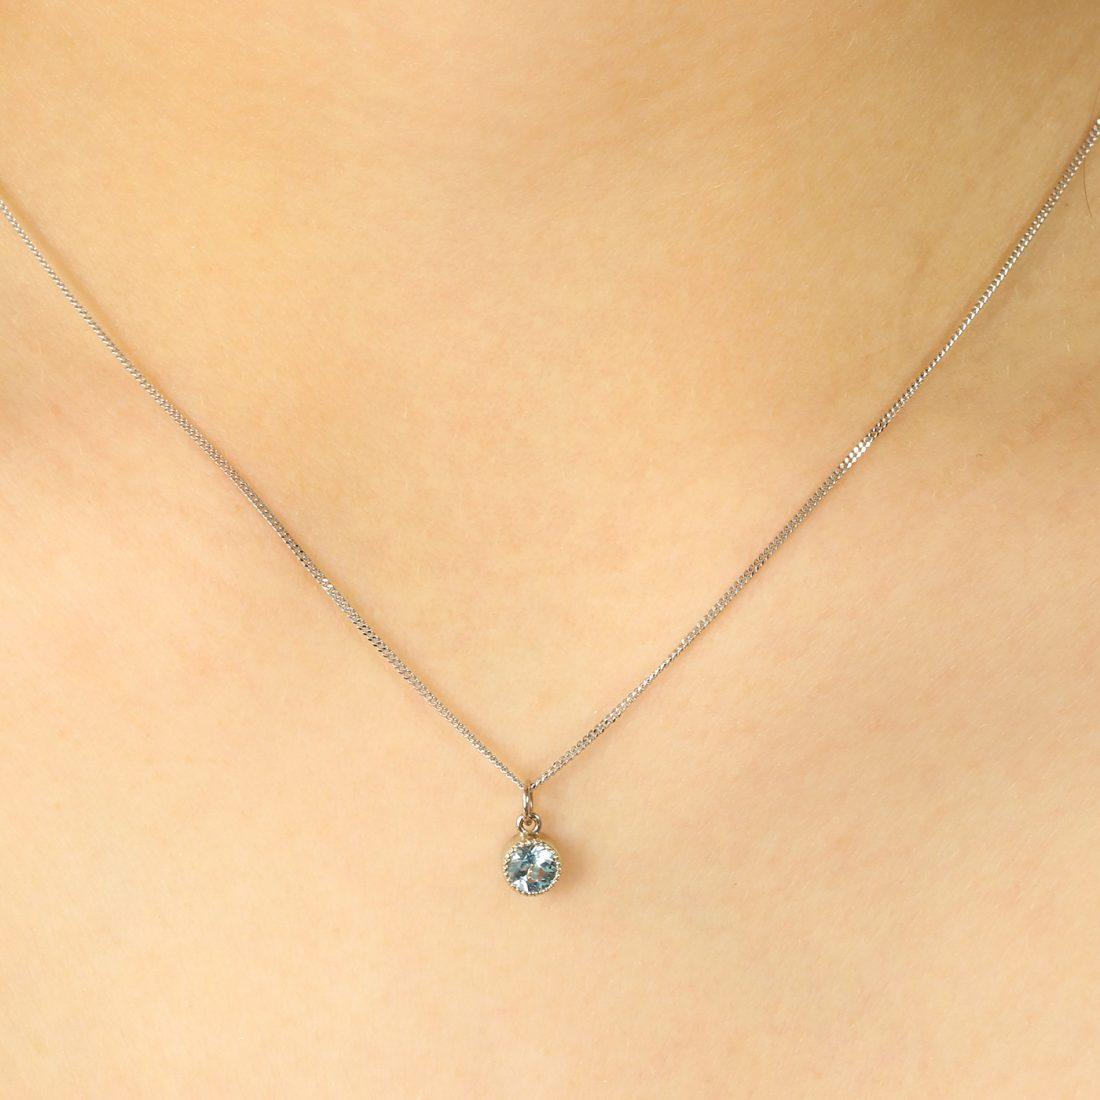 18ct White Gold Petite Milgrain Aquamarine Pendant - March Birthday Gift